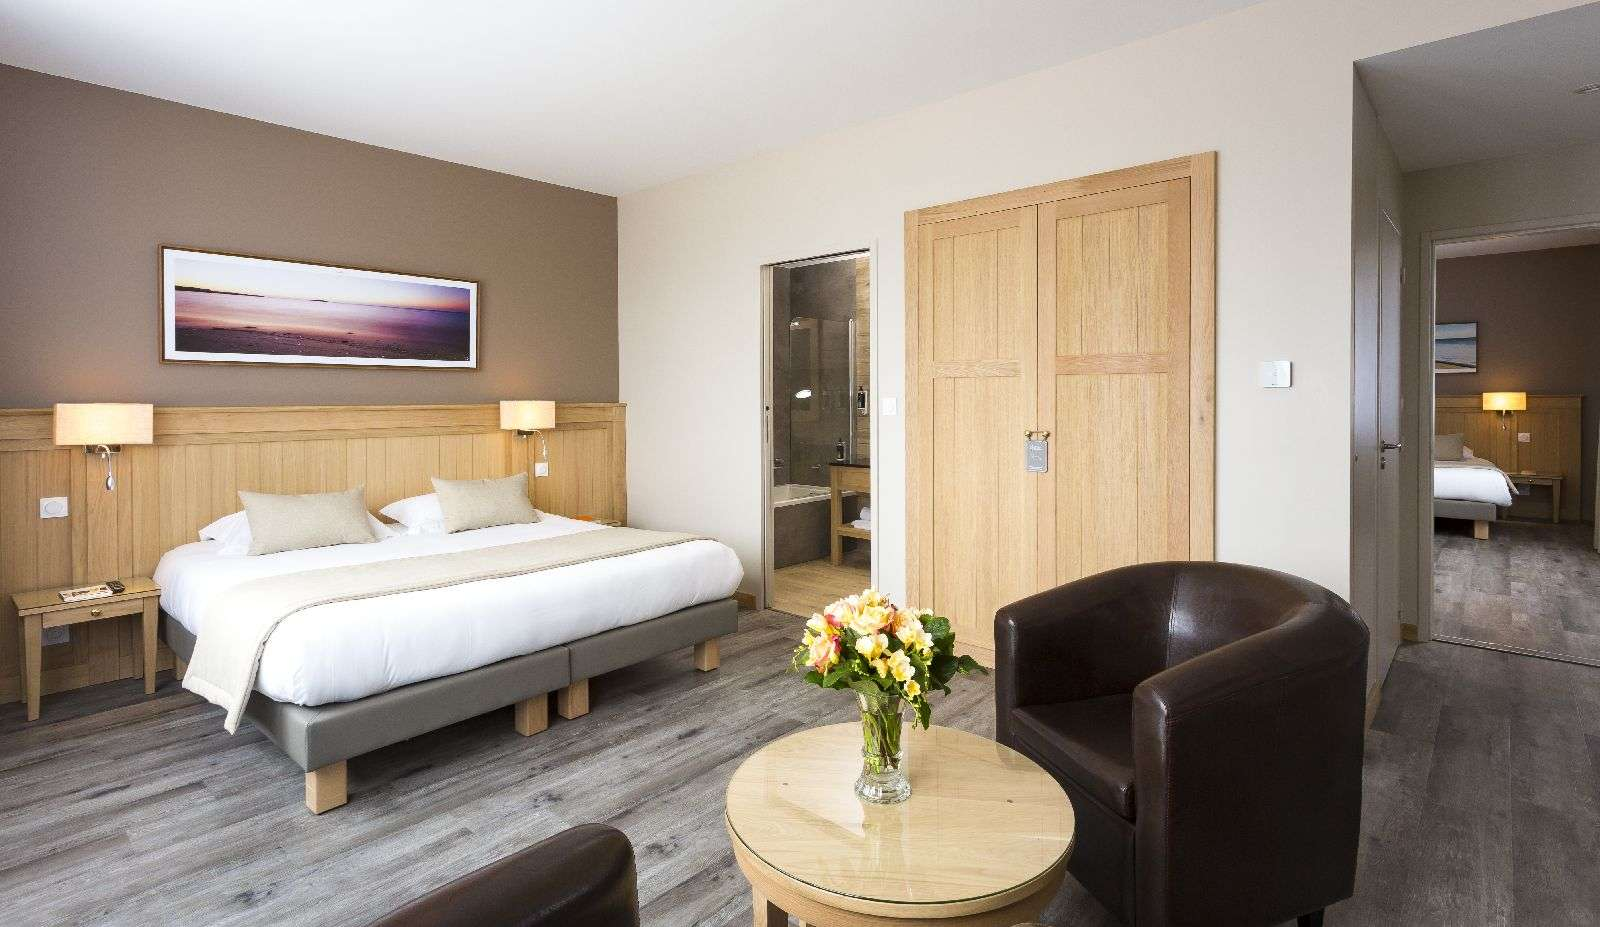 chambre-double_hebergement_hotel-le-tumulus_carnac3